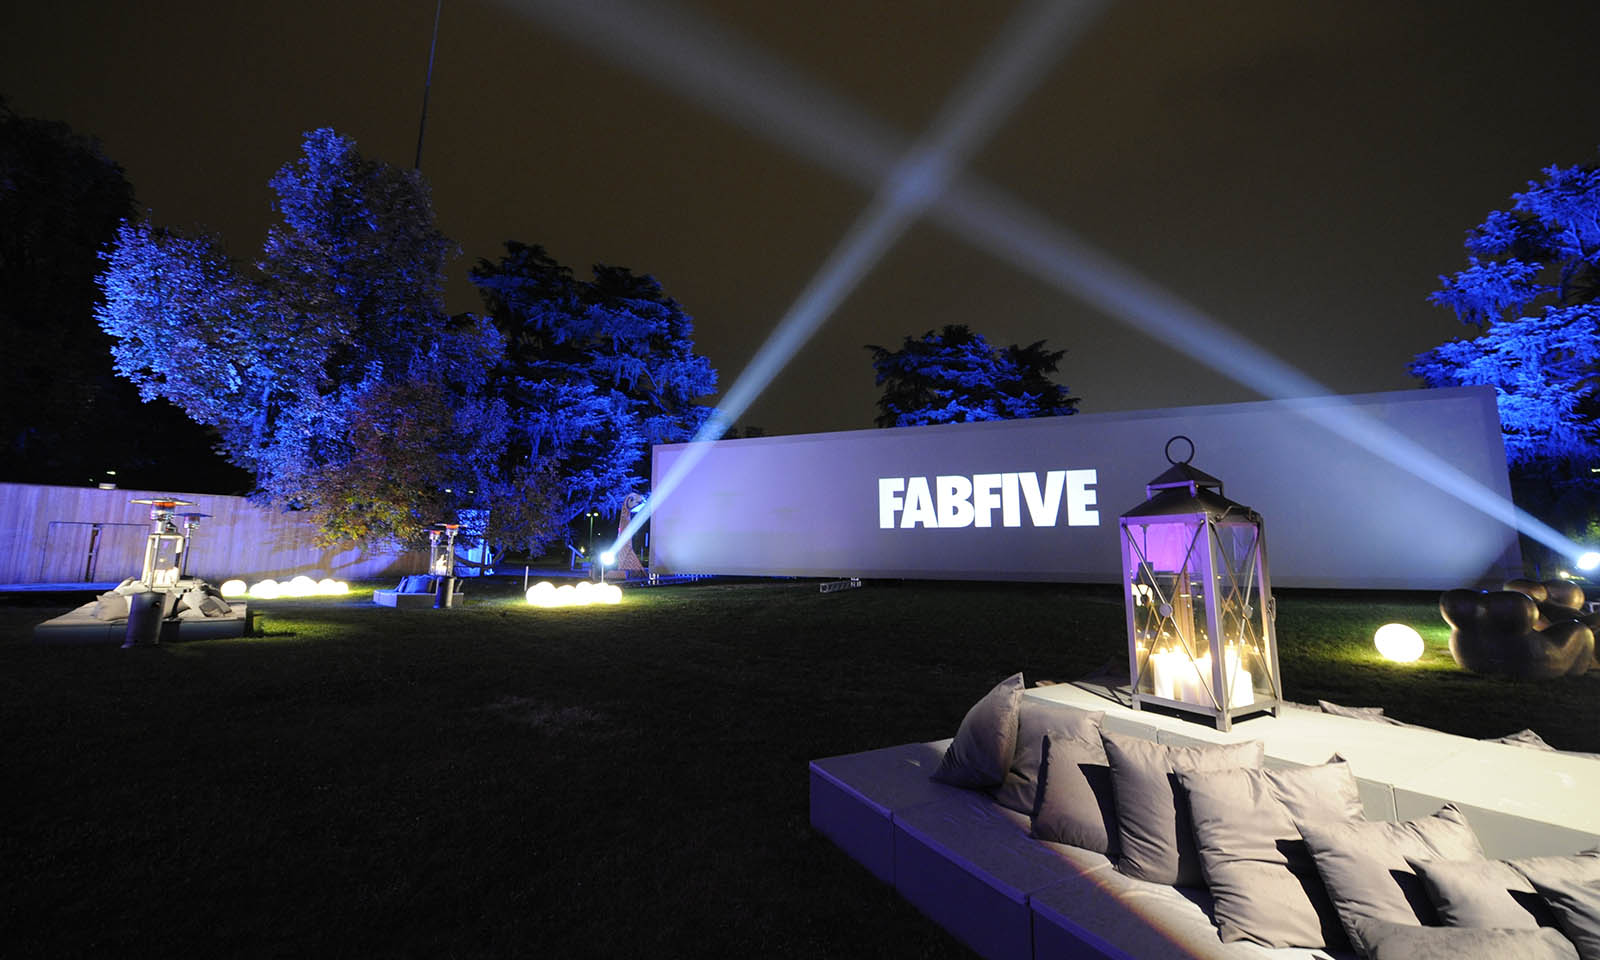 Vanity Fair Fabfive